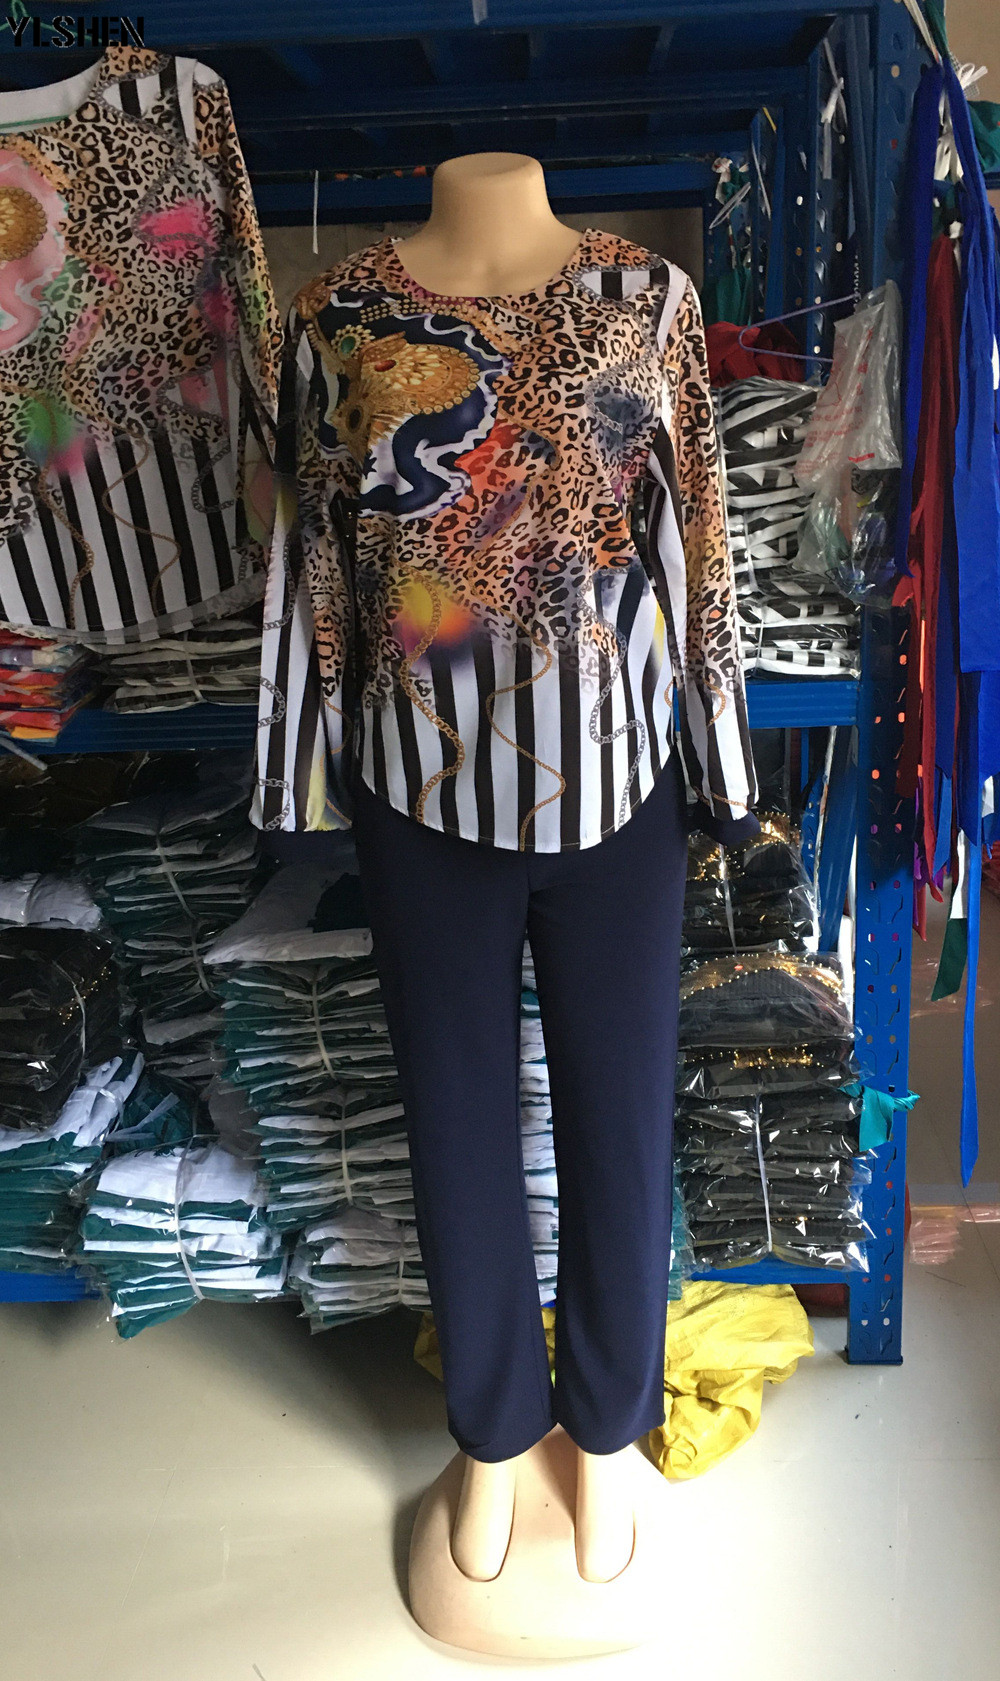 Two 2 Piece Set African Clothes Africa 2020 Dashiki Fashion Print Dresses Suit Bazin Top Pants Elastic Party Plus Size Clothing 14